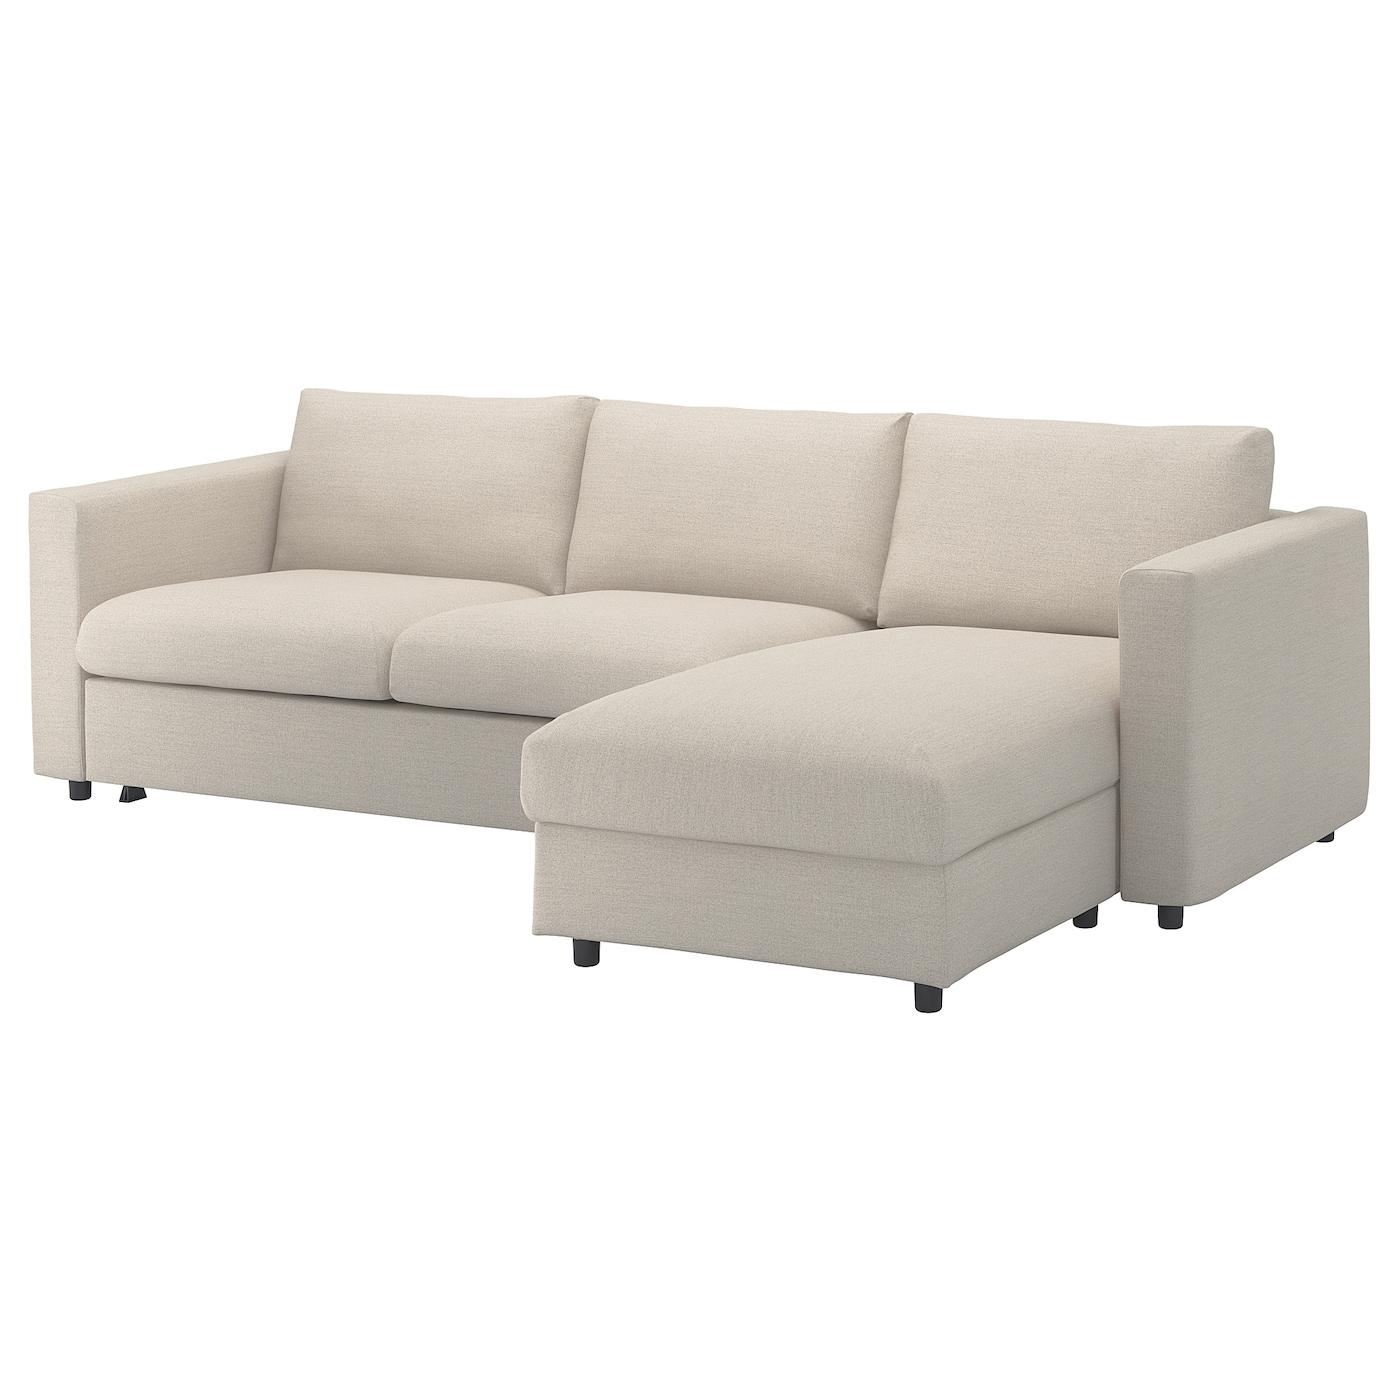 - FINNALA Sleeper Sofa, With Chaise/Gunnared Beige - IKEA